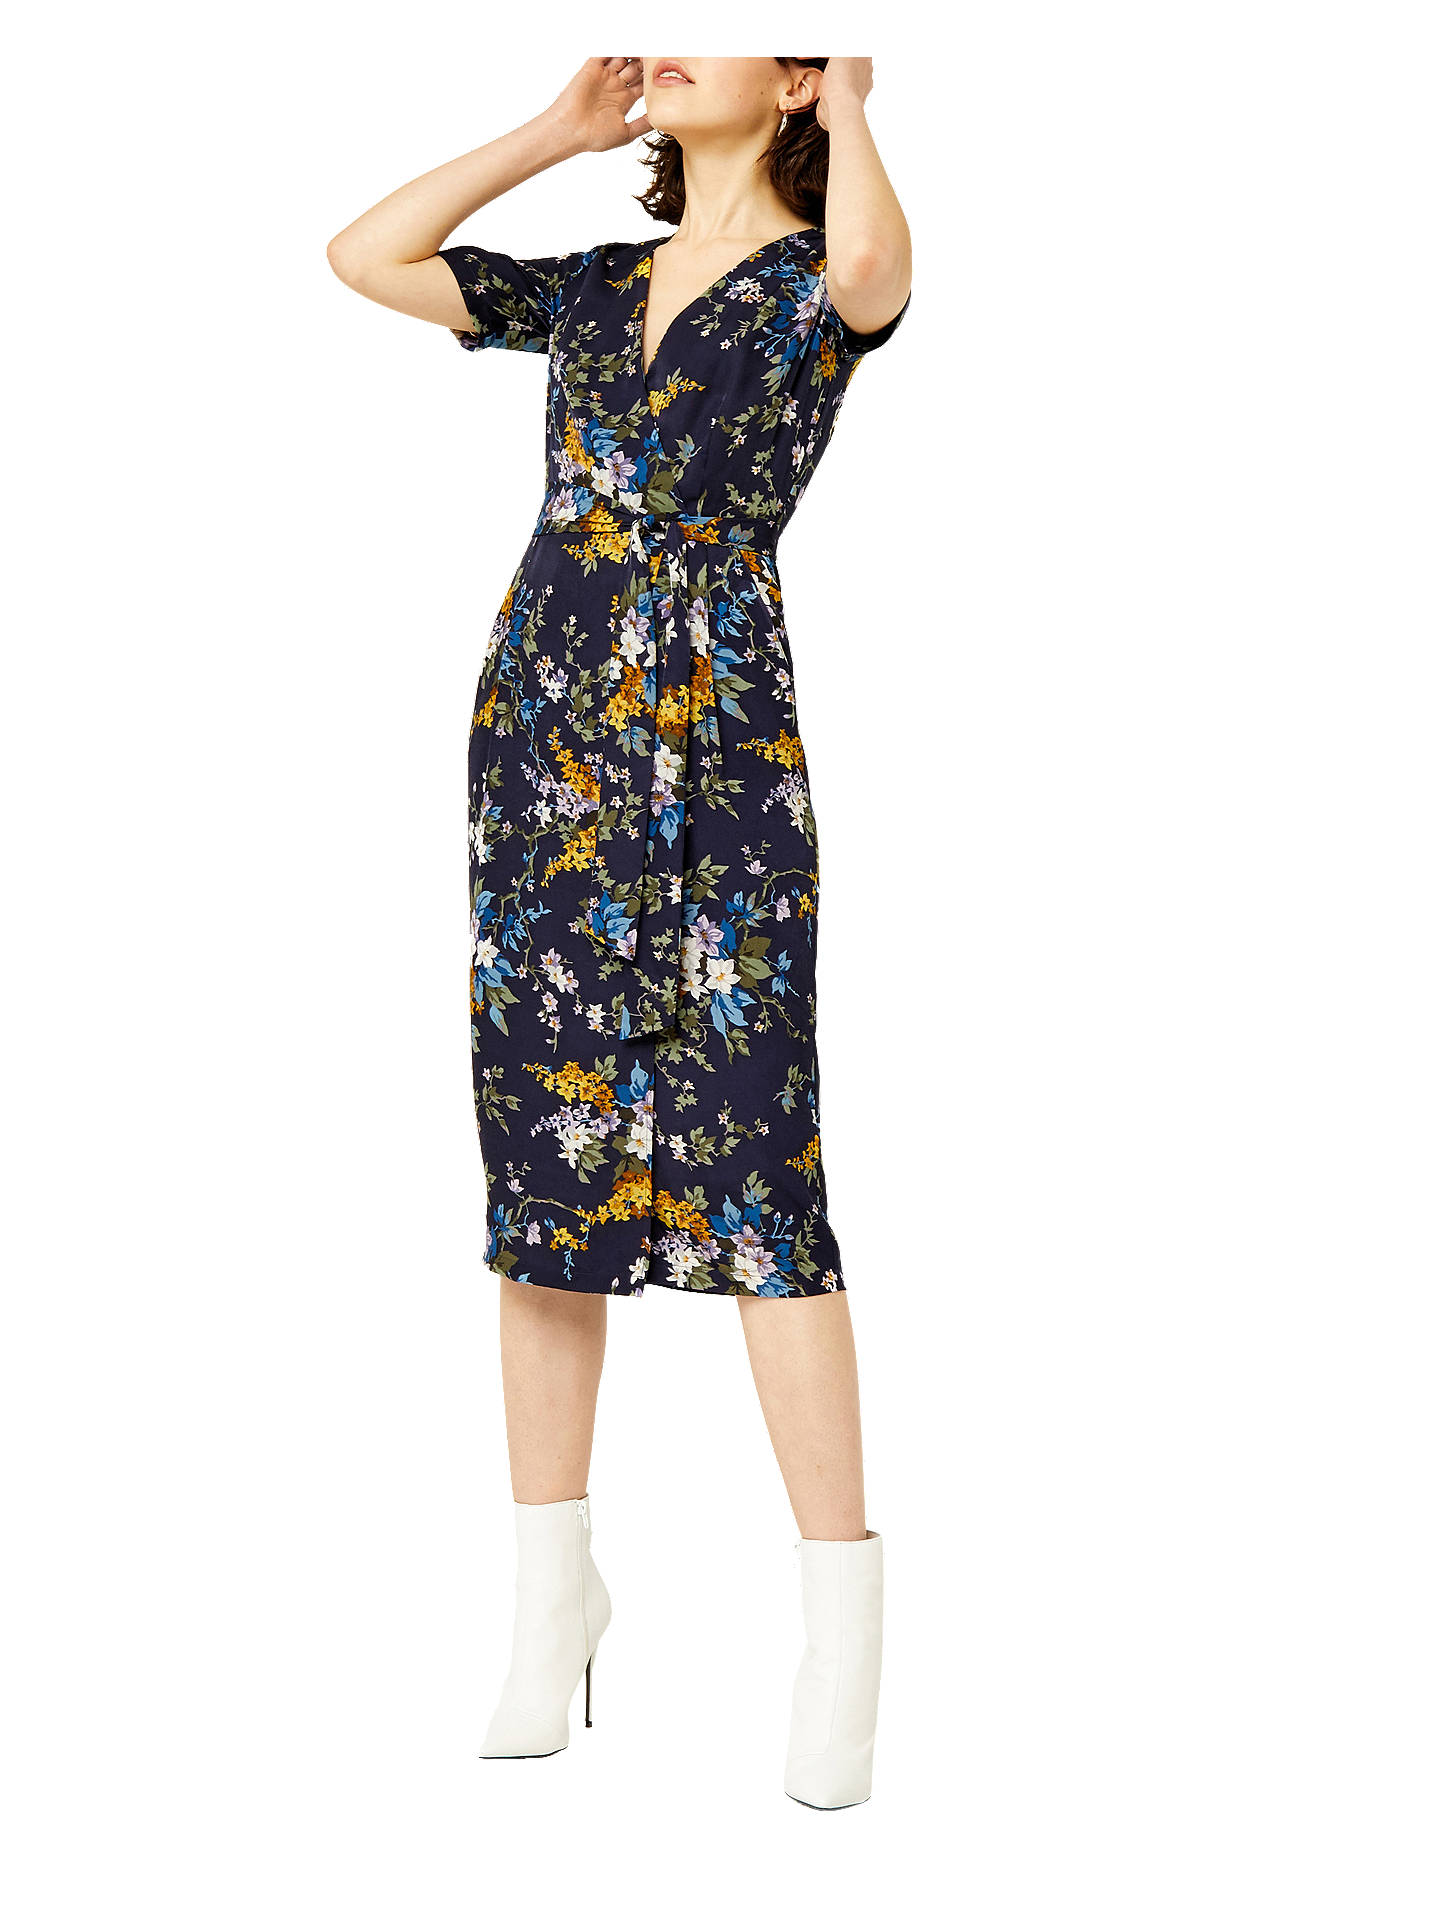 678d7dac7c94 Buy Warehouse Trailing Floral Midi Dress